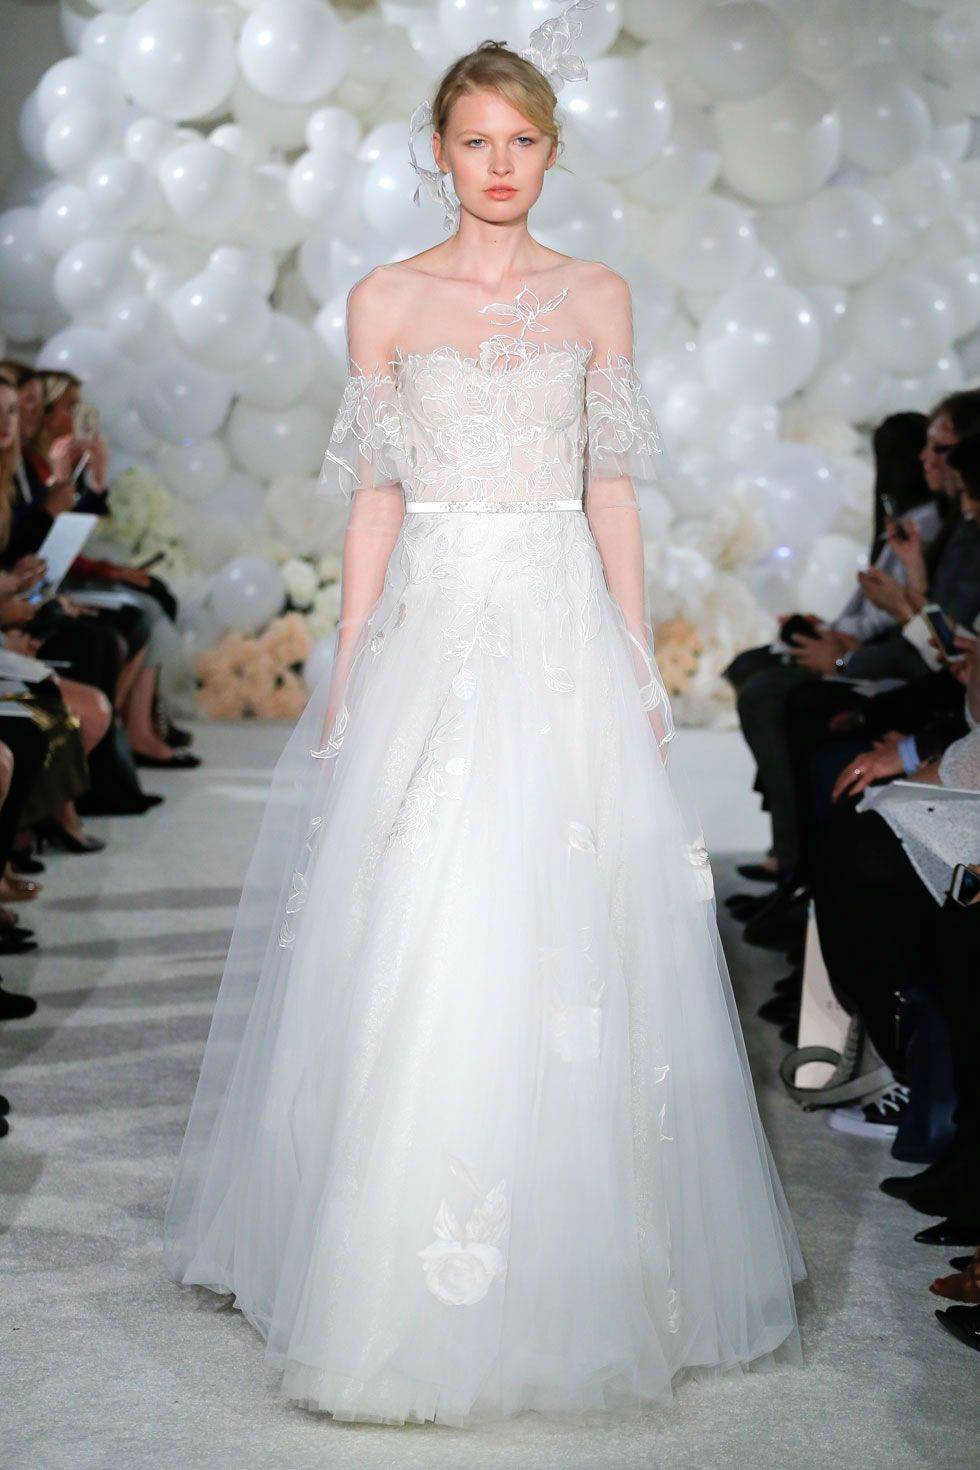 Caribbean wedding dress